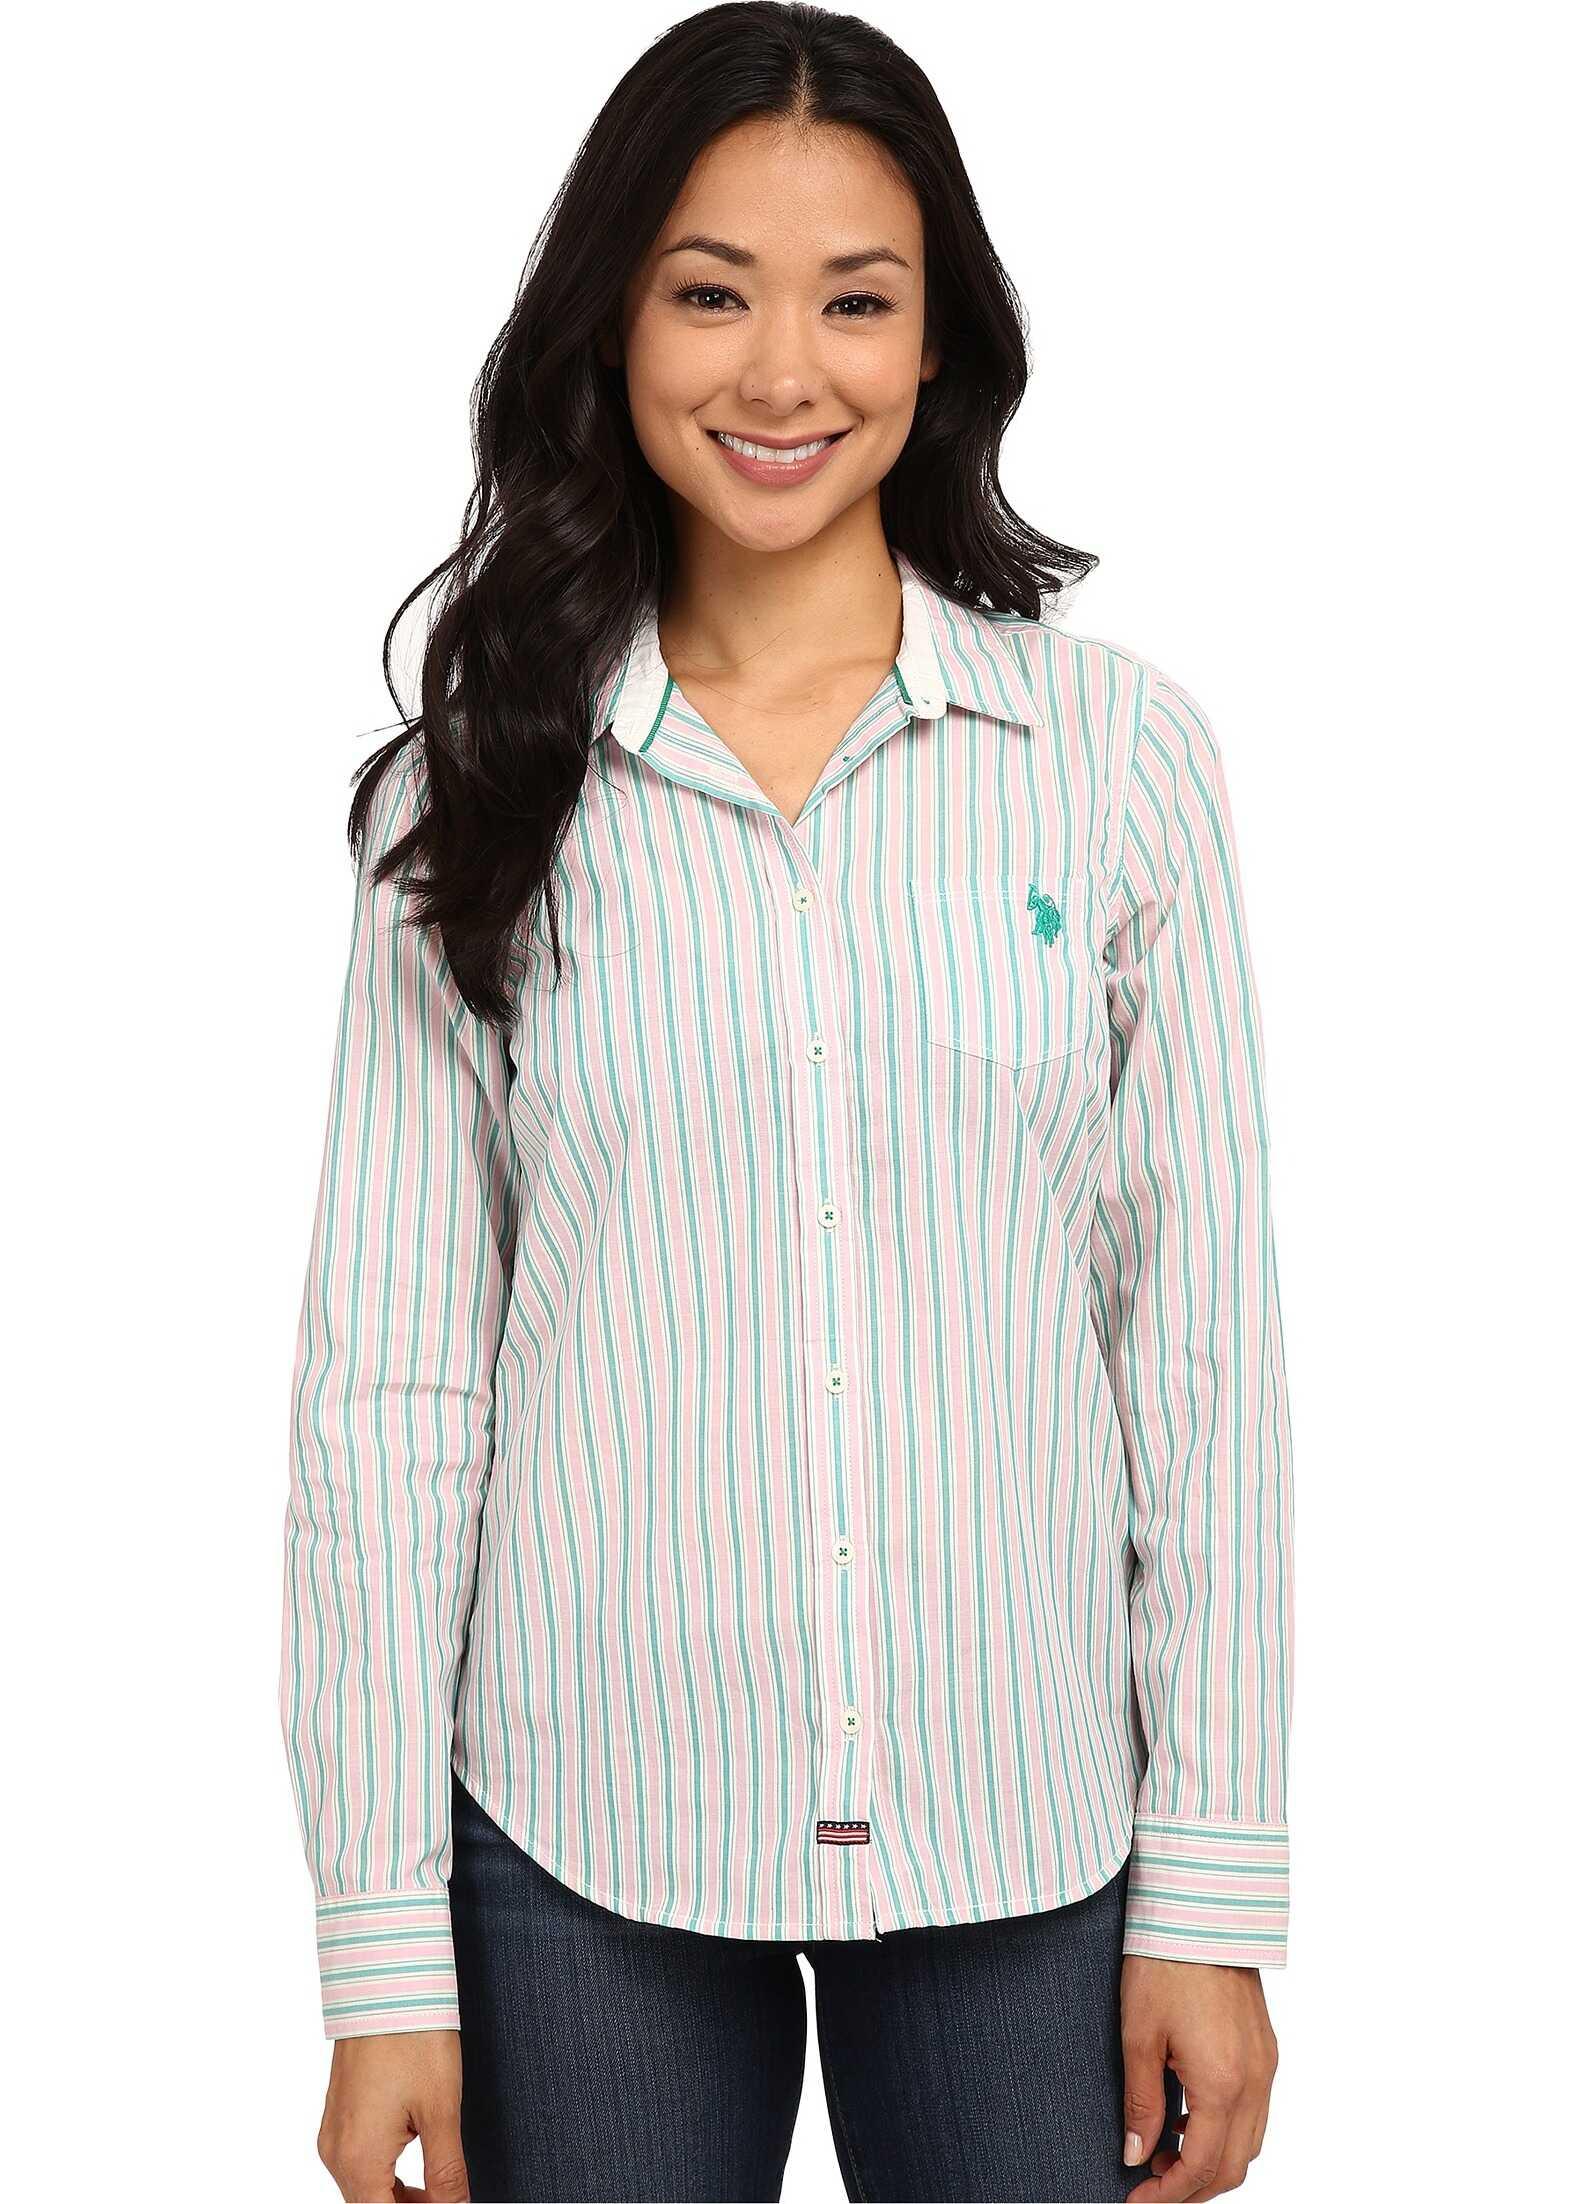 U.S. POLO ASSN. Striped Poplin Shirt Dynasty Green